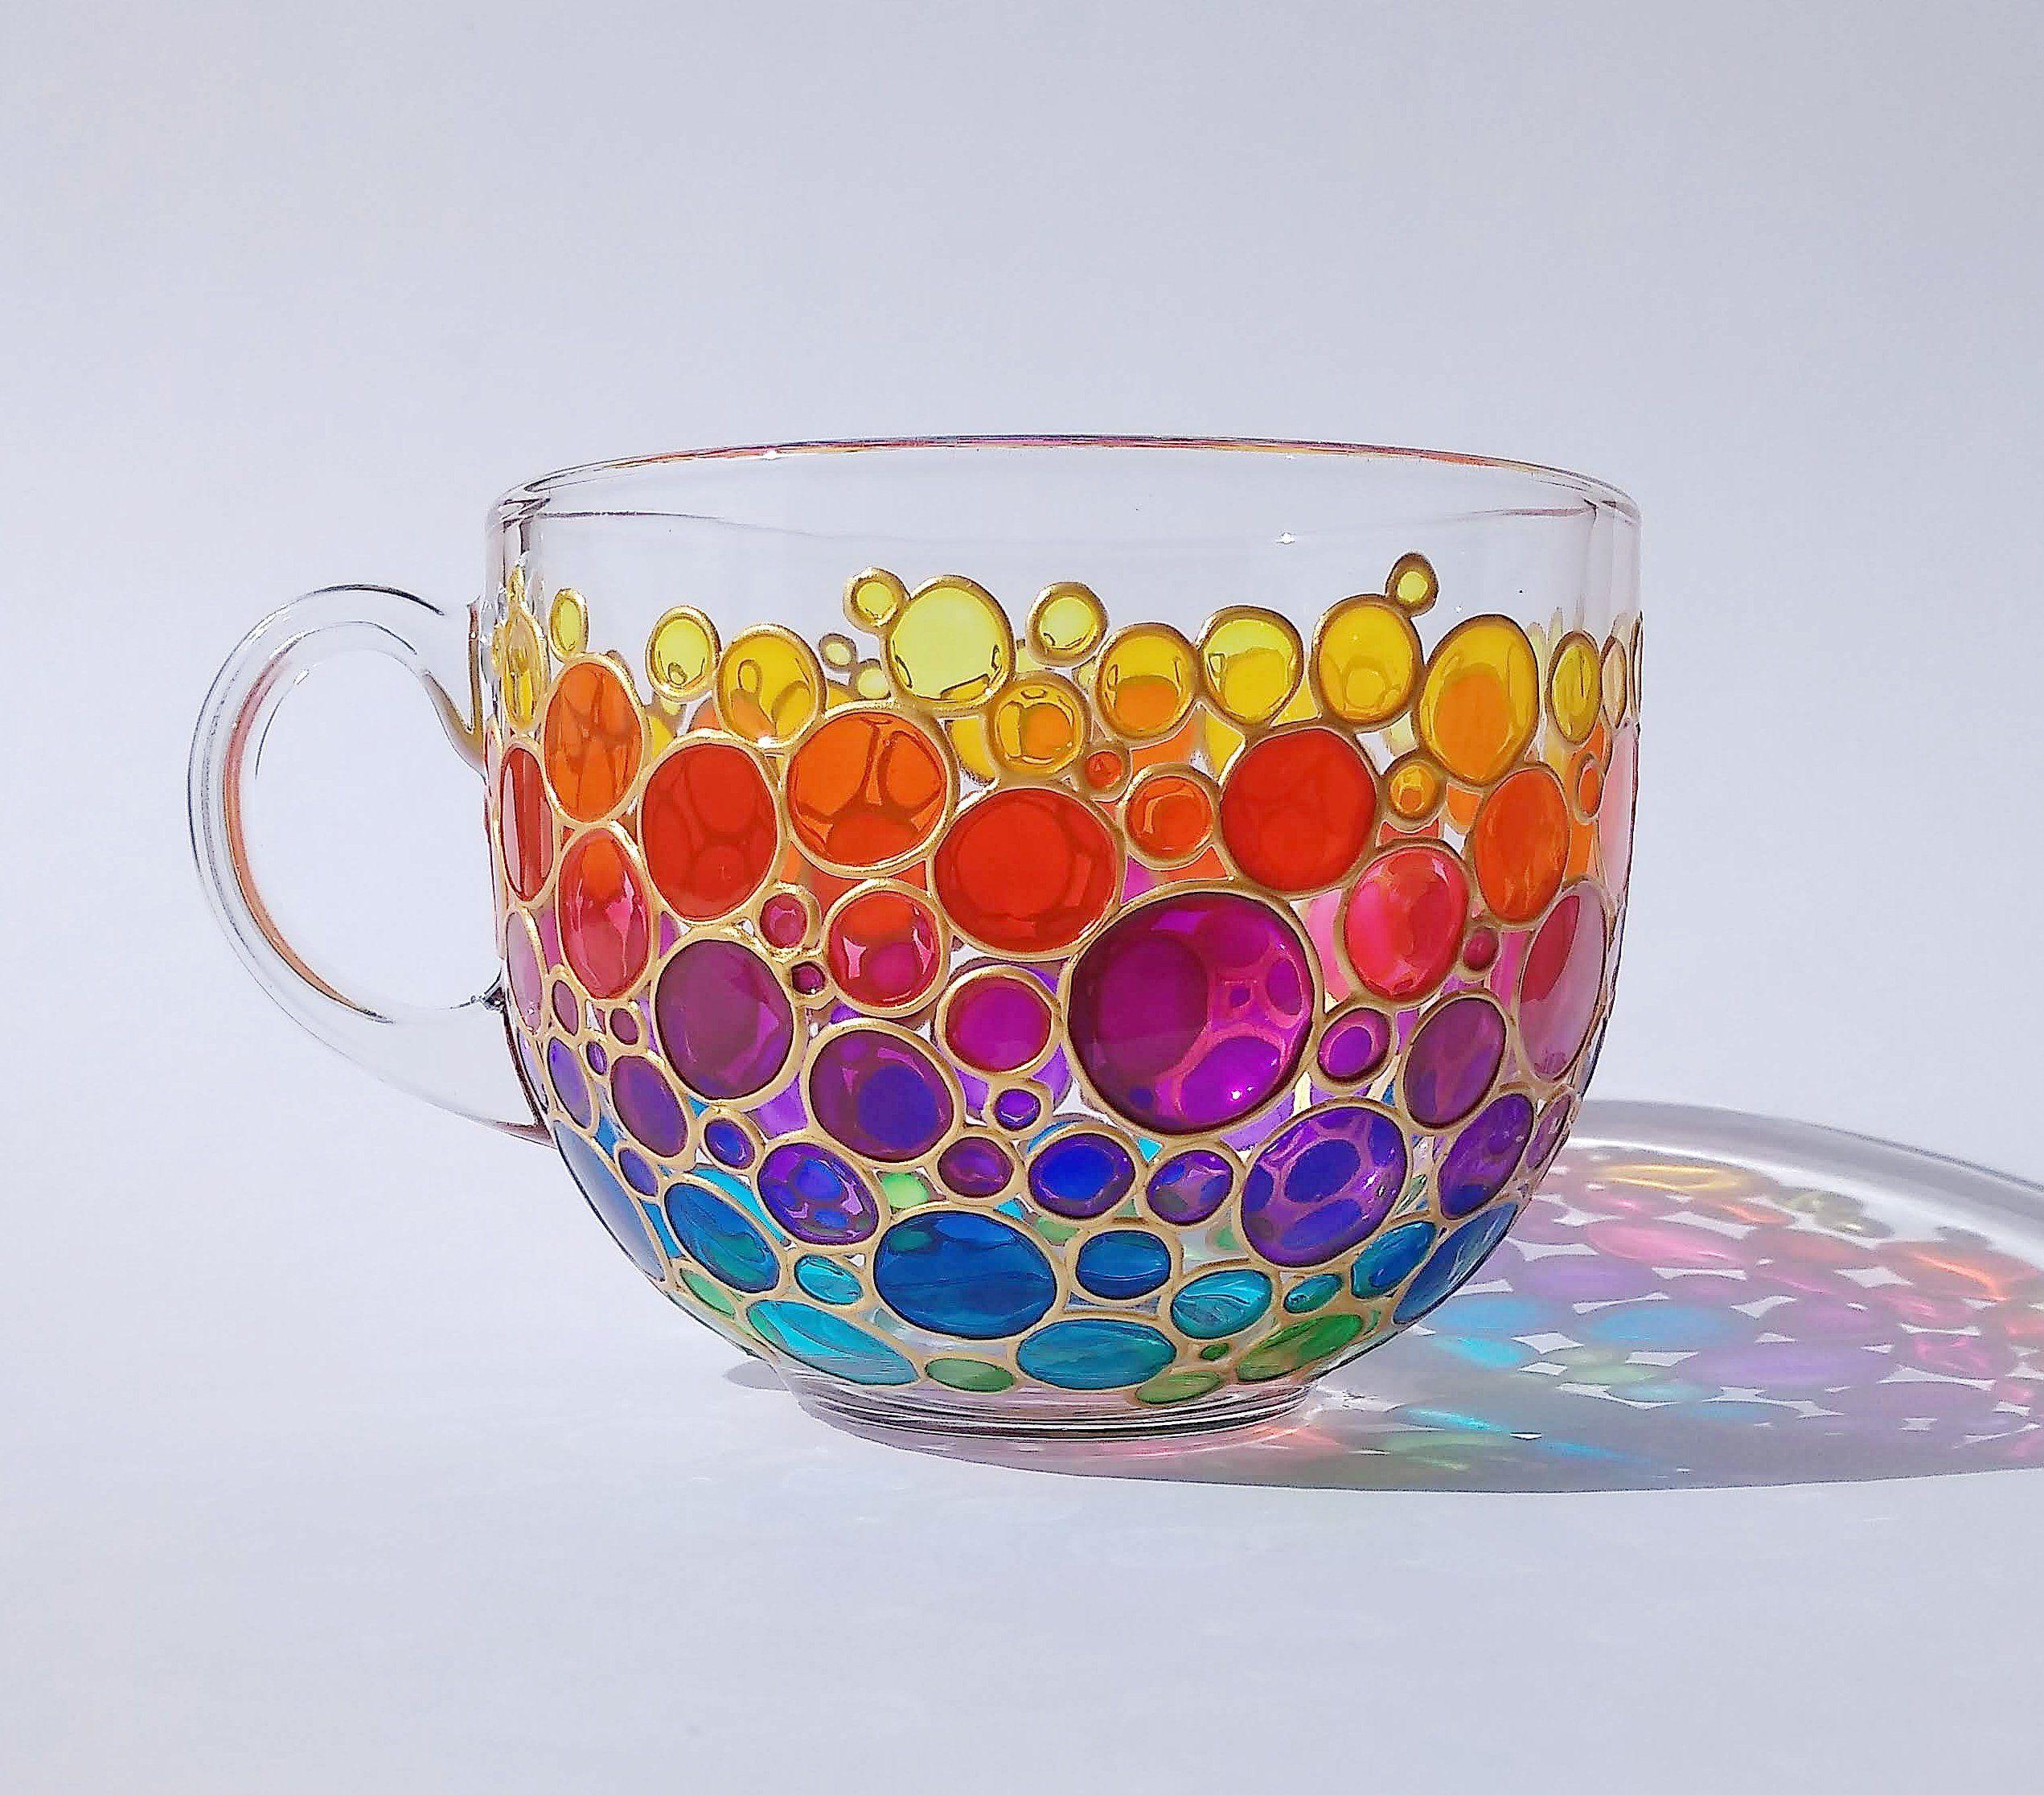 Big Rainbow Coffee Mug Hand Painted Bubbles Glass Big Cup With